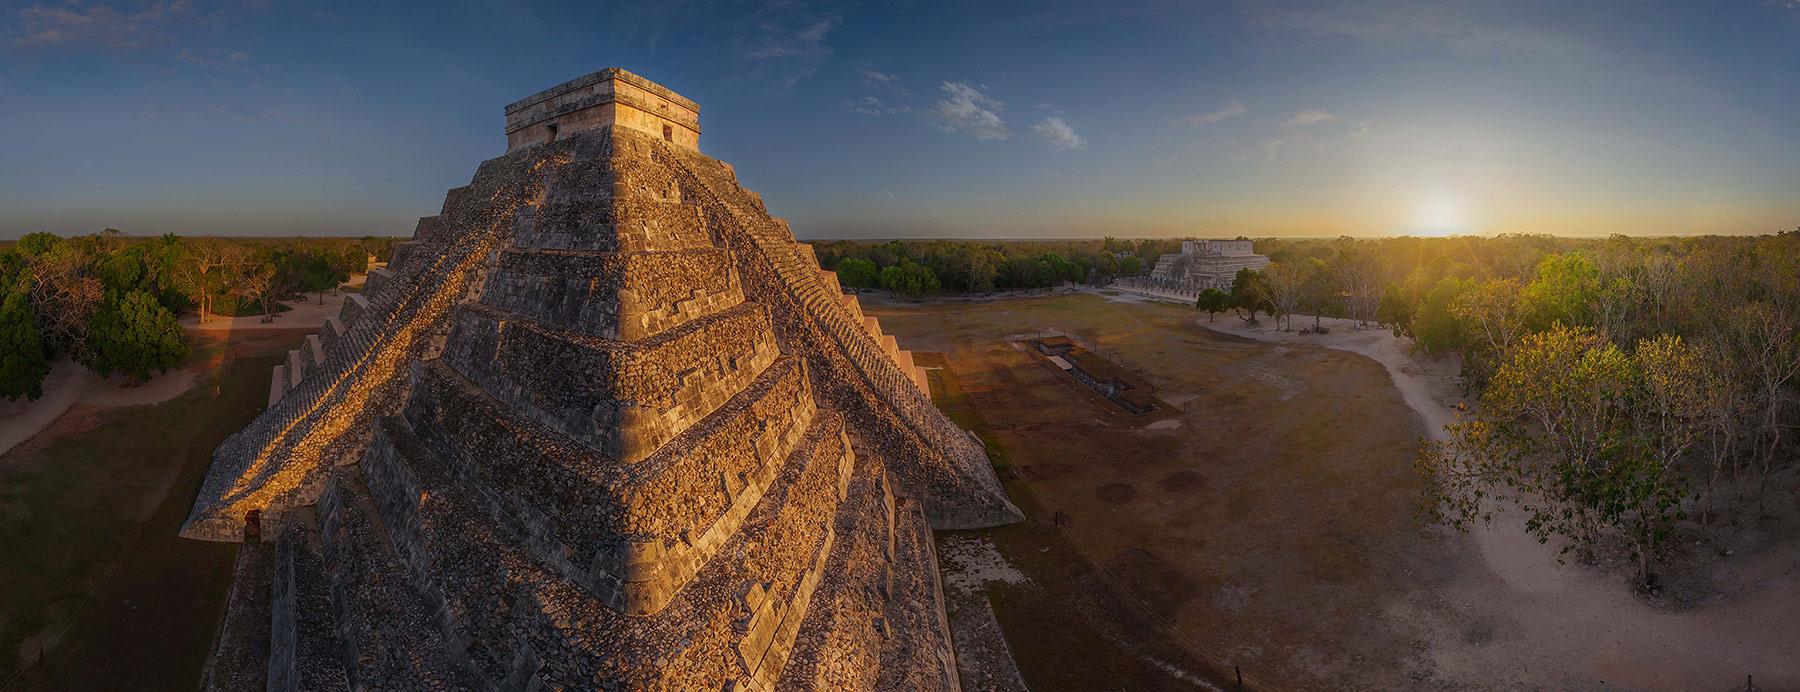 Chichen Itza, Mexico. (AIRPANO /CATERS NEWS)